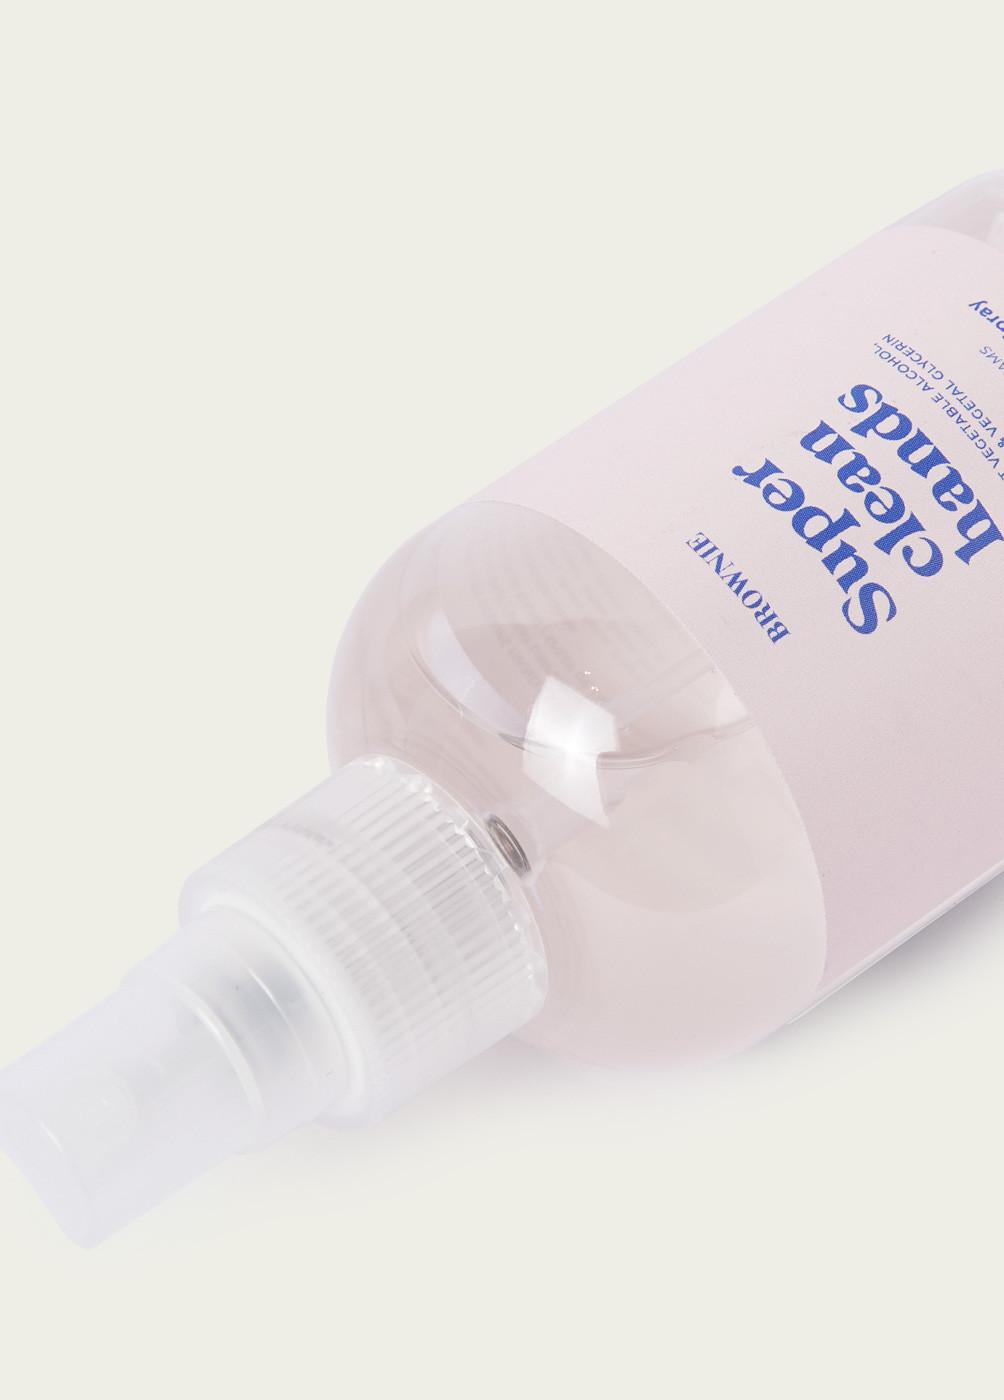 Spray Super Clean Hands CO - 3